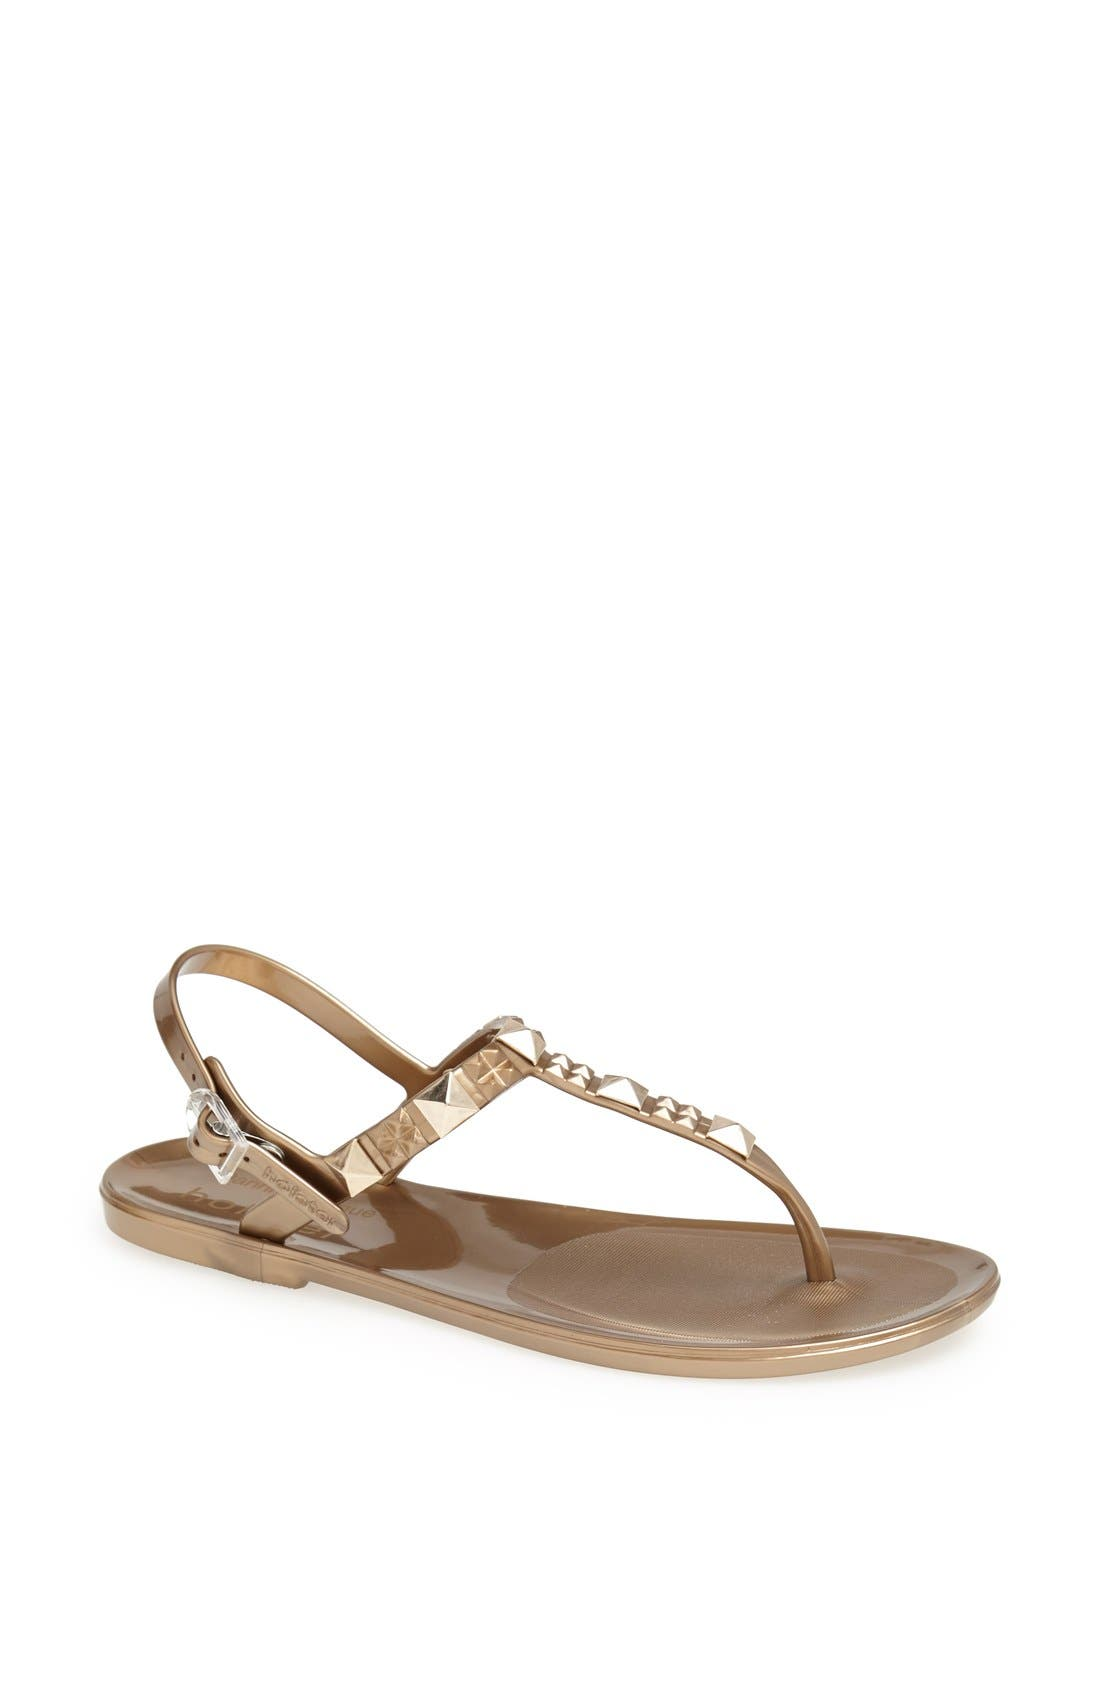 Alternate Image 1 Selected - Holster Fashion 'Rockstar' Jelly Thong Sandal